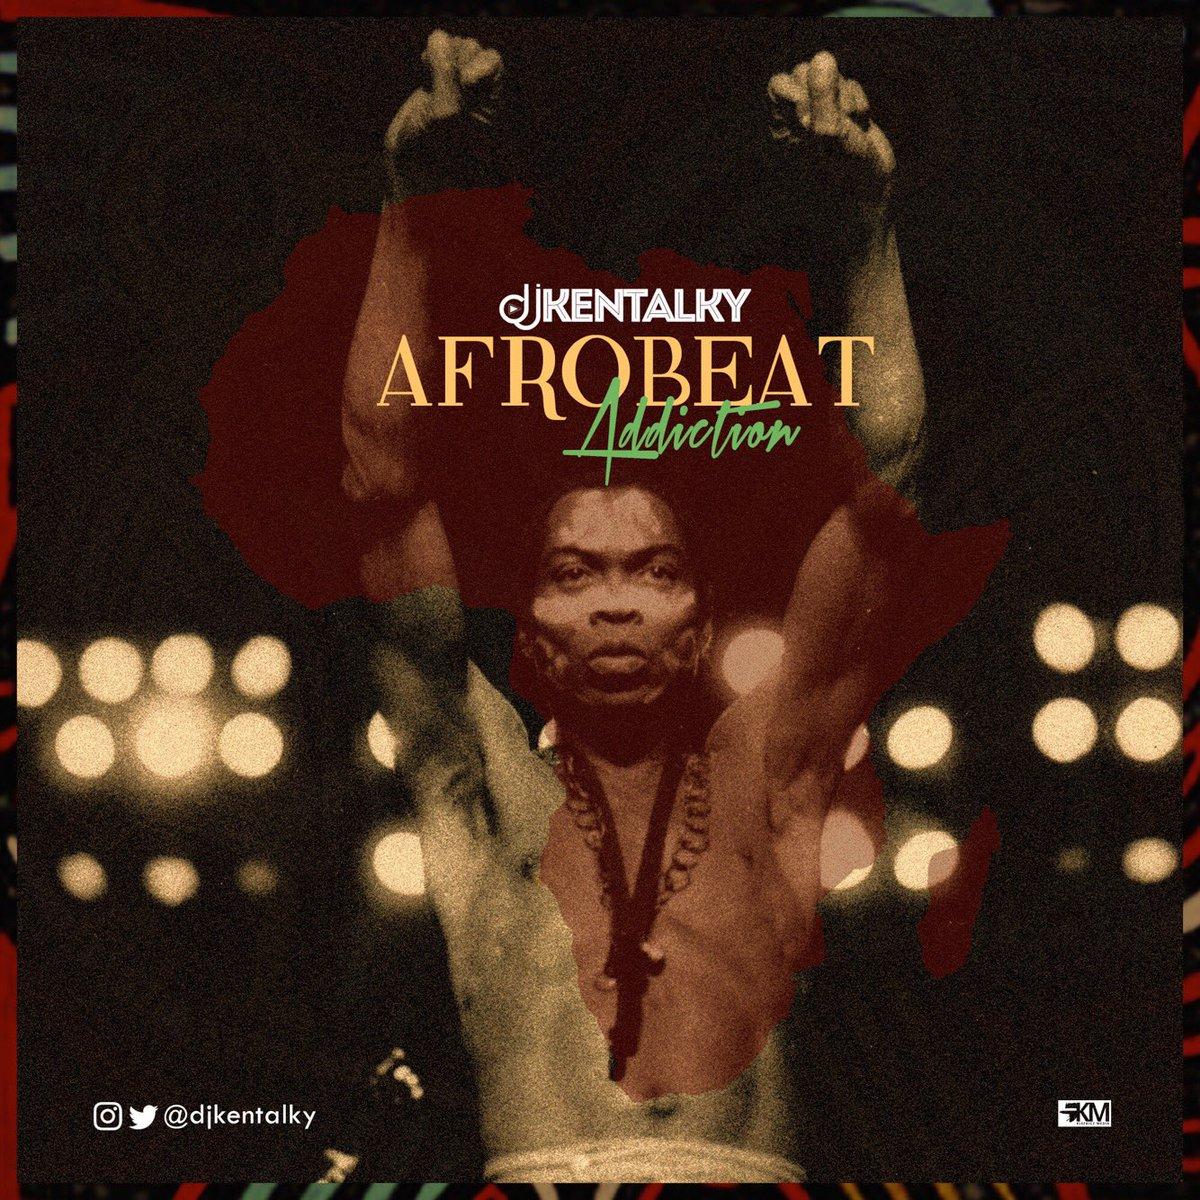 Dj-Kentalky-Afrobeat-Addiction-Mixtape-Afromixx